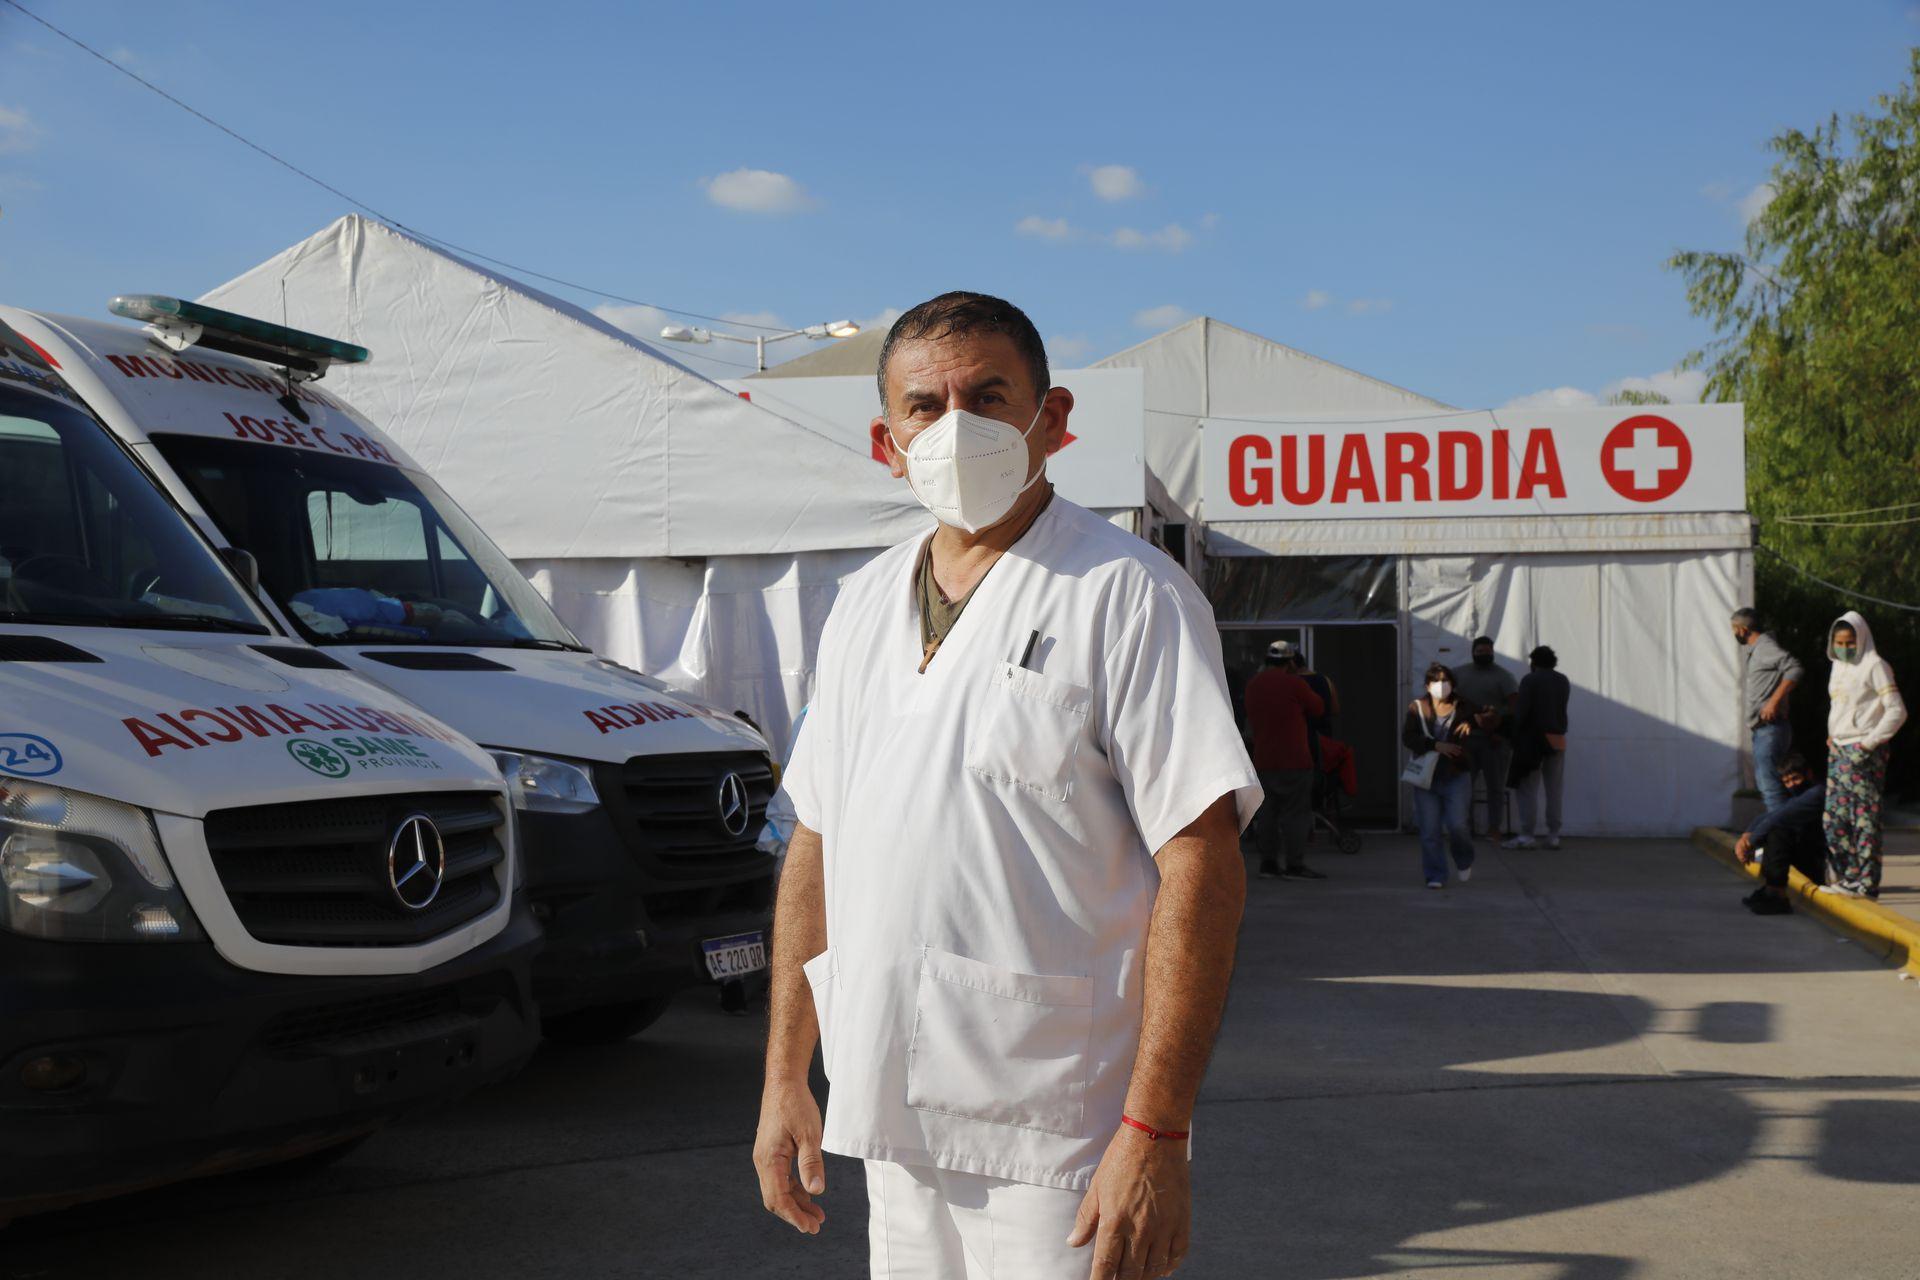 Fabien Truocco, Nurse at Domingo Anggio Municipal Hospital, by Jose C. Paz